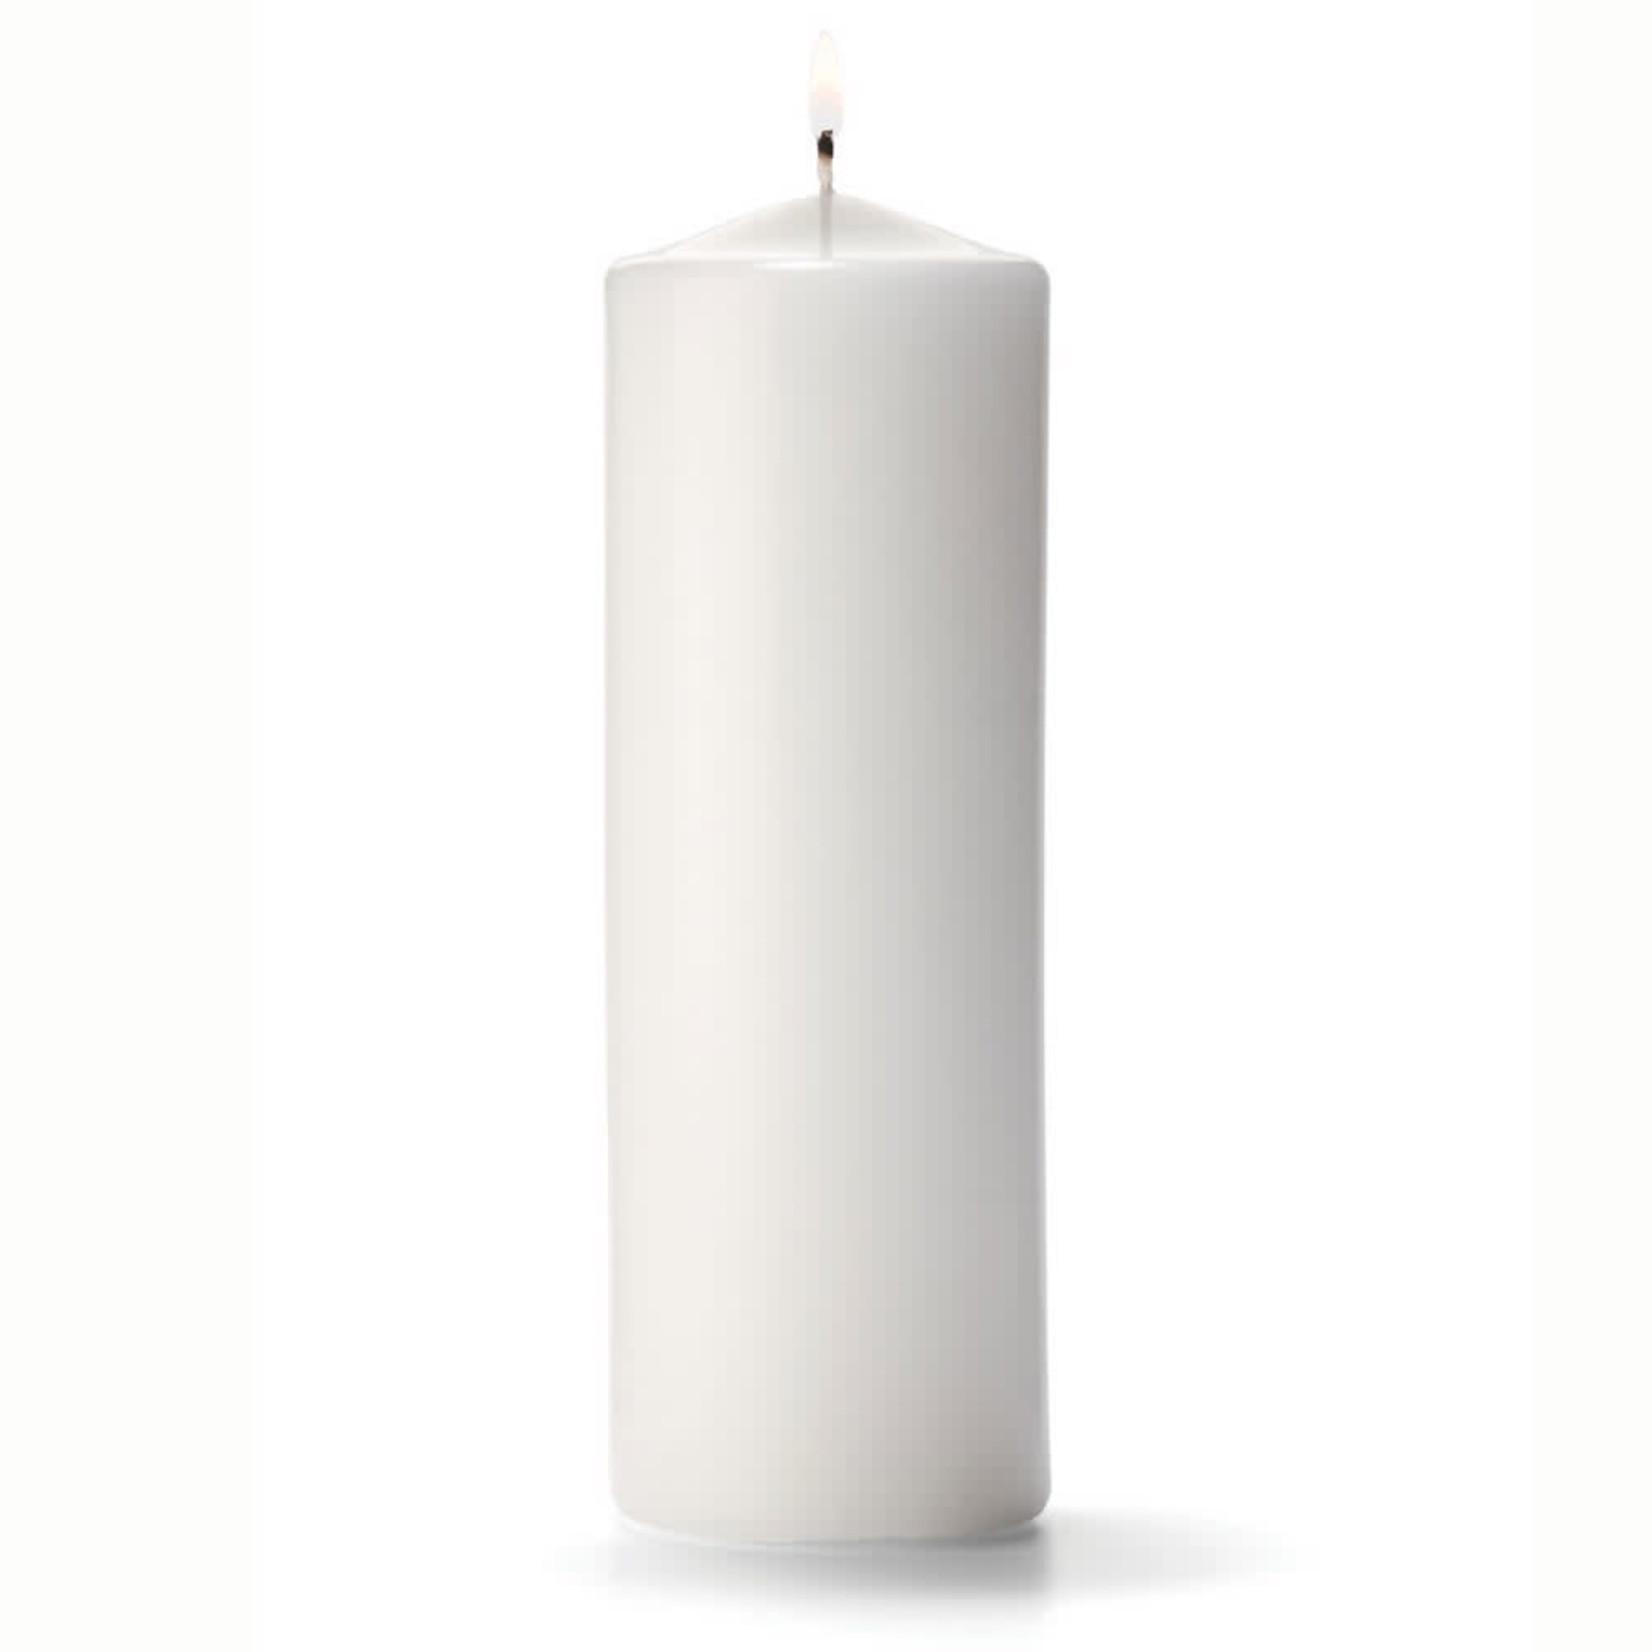 "3""""X9""""H, WHITE Round Pillar Candle"